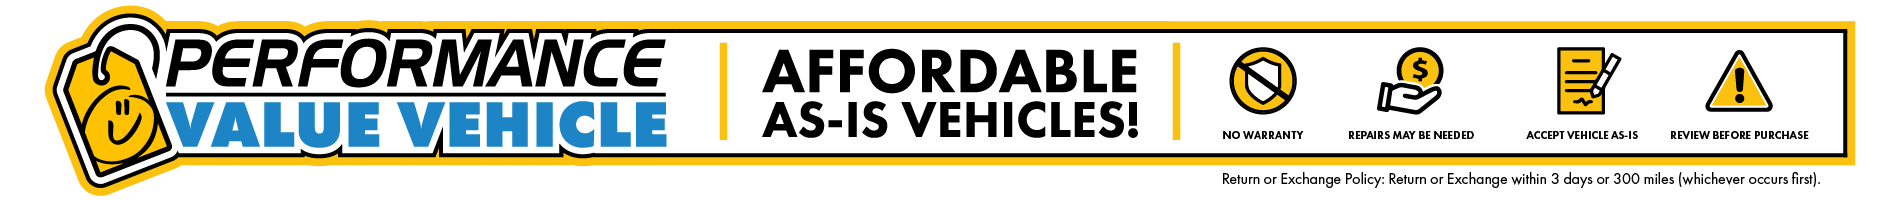 performance value vehicle page top desktop